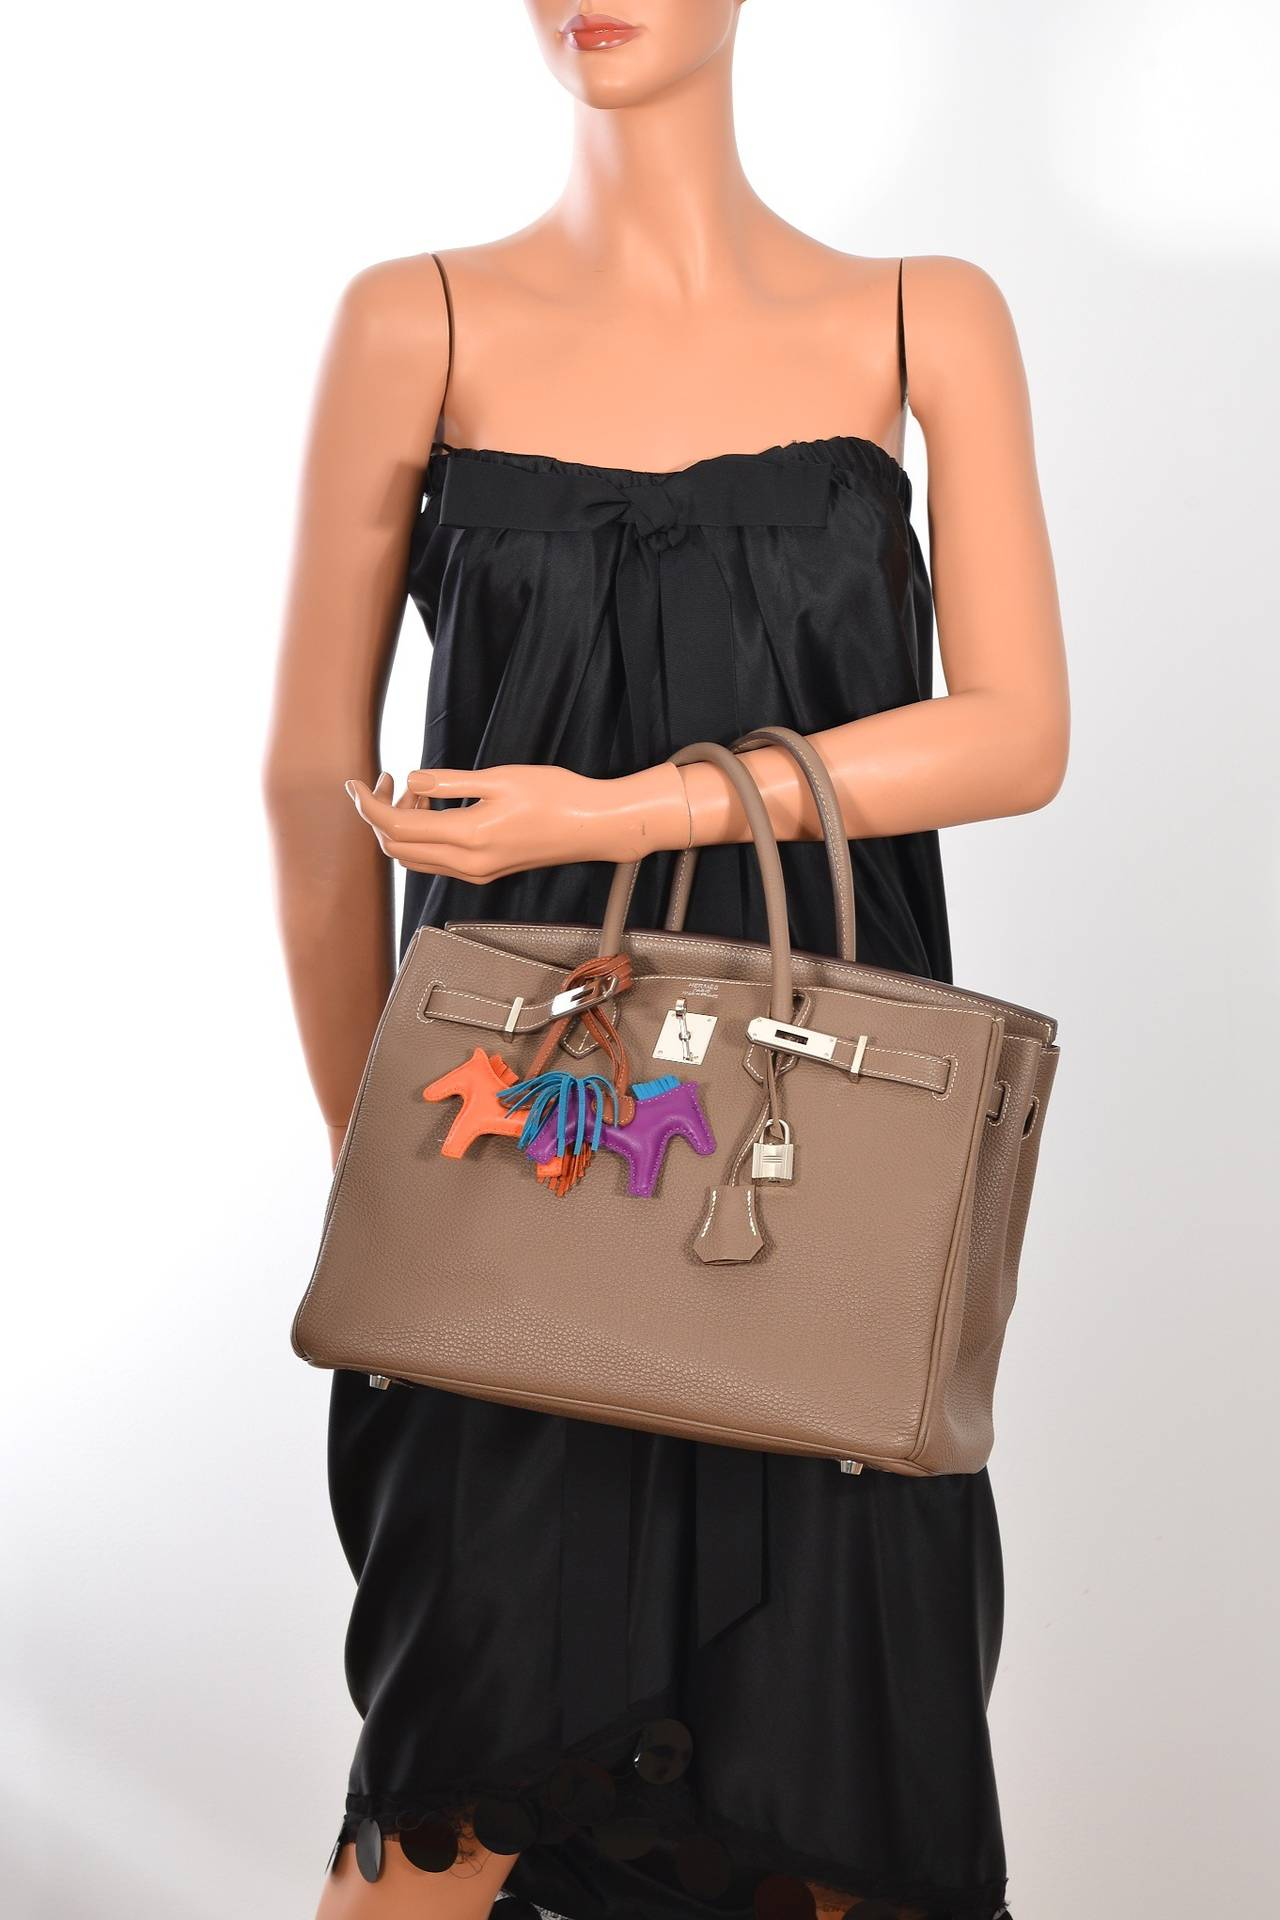 fake birkin bags for sale - Hermes Rose Sakura Kelly Pochette Cut Clutch Bag Swift Palladium